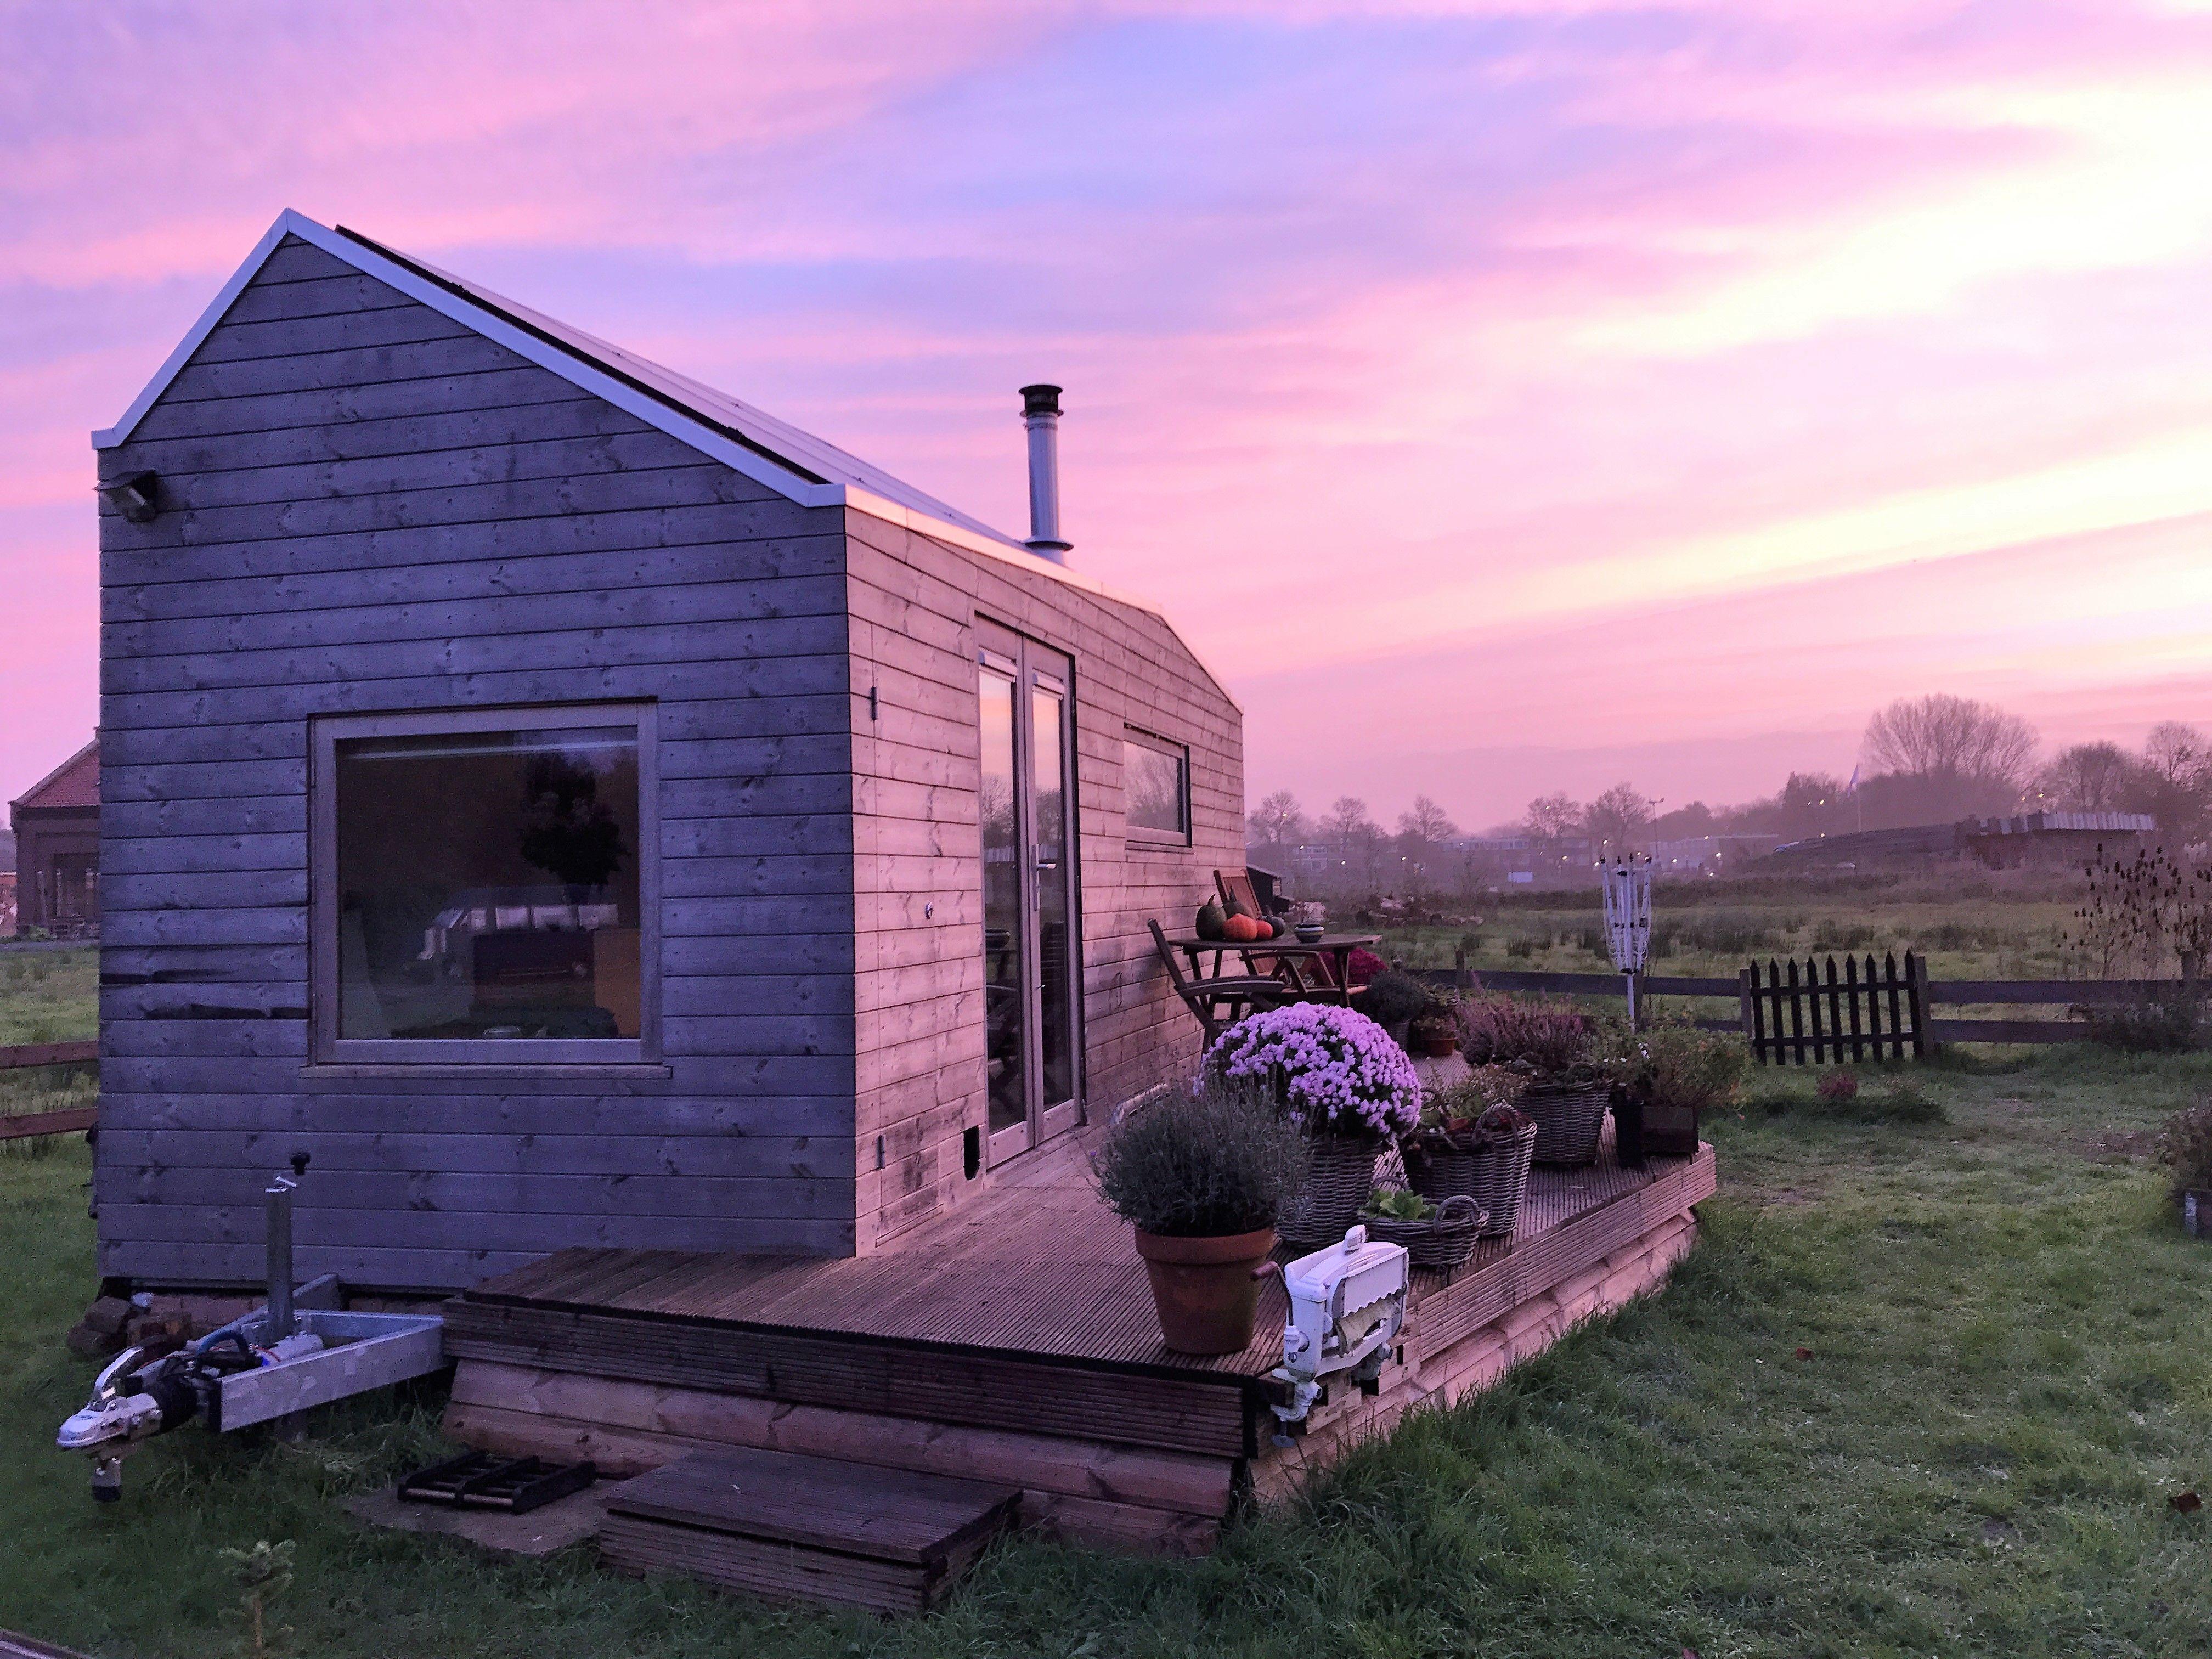 Morning light | tiny house | Pinterest | Morning light, Tiny houses ...